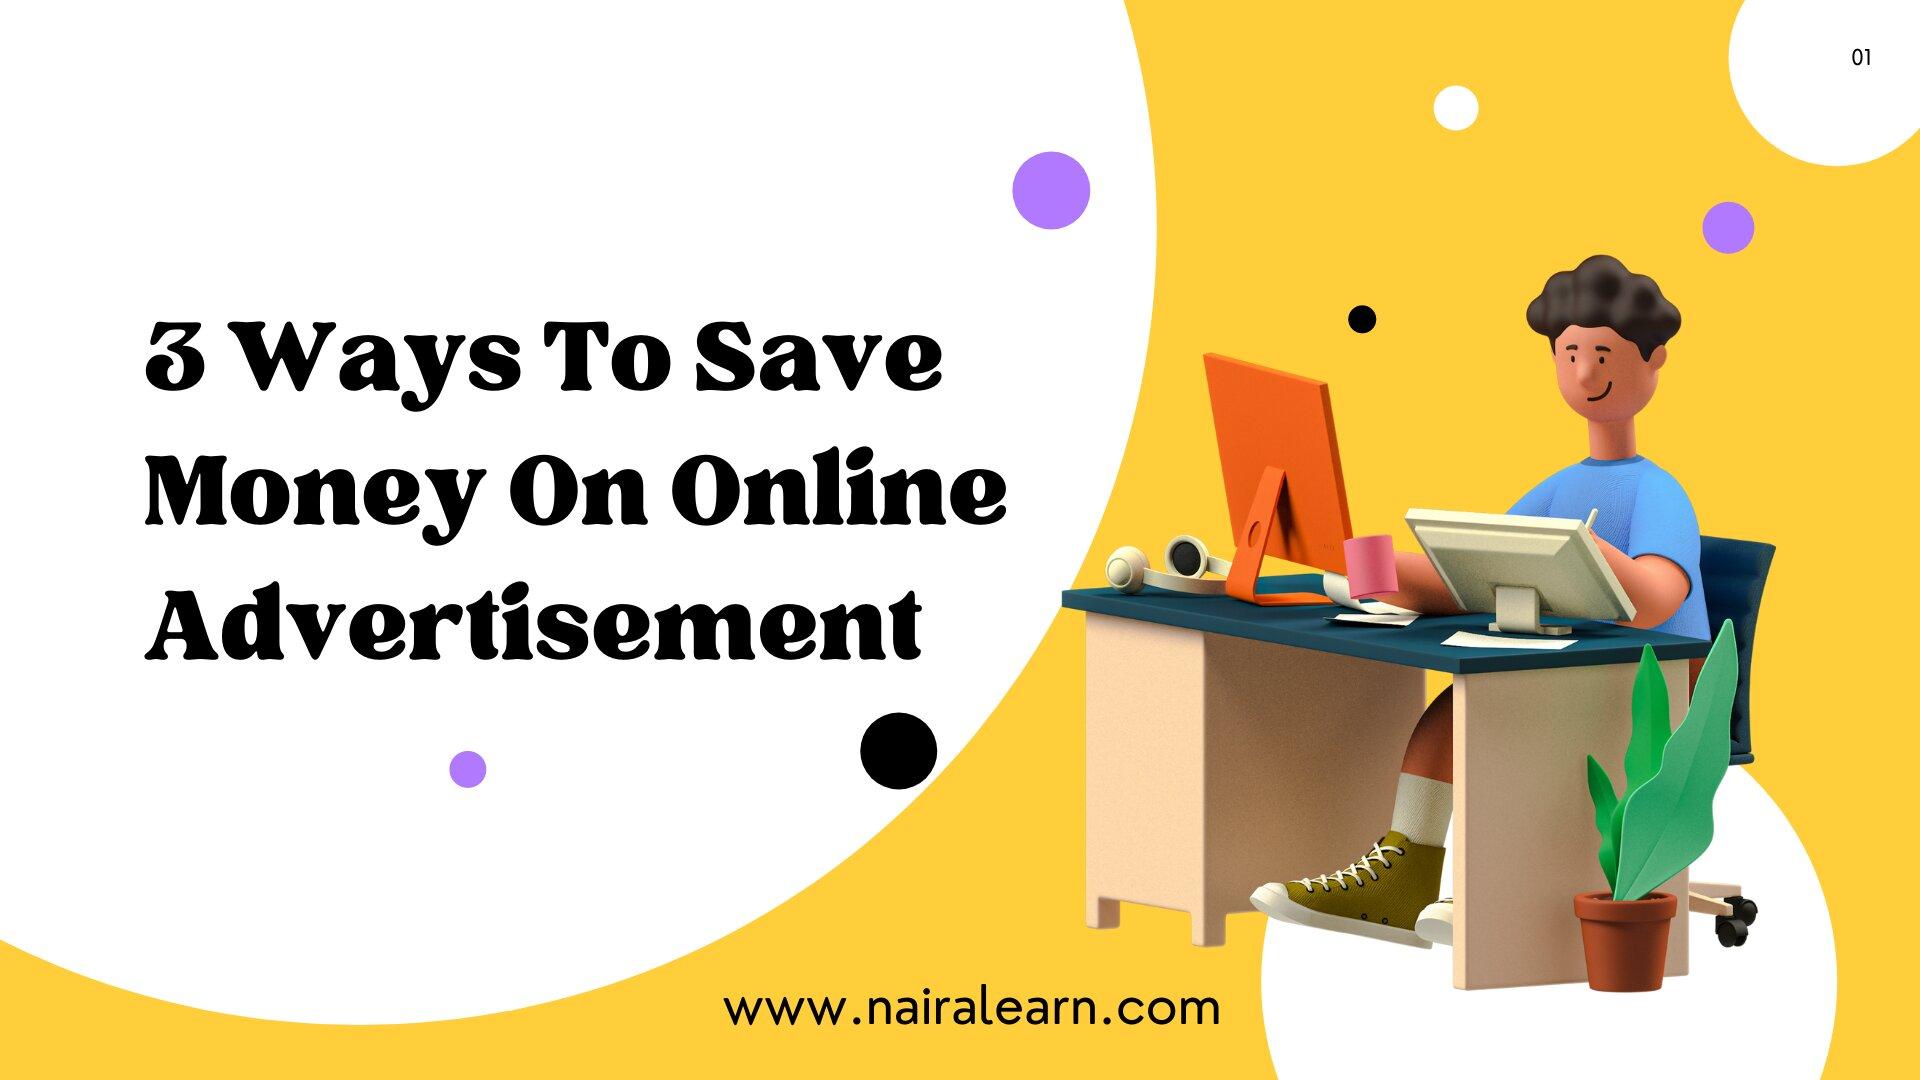 3 Ways To Save Money On Online Advertisement